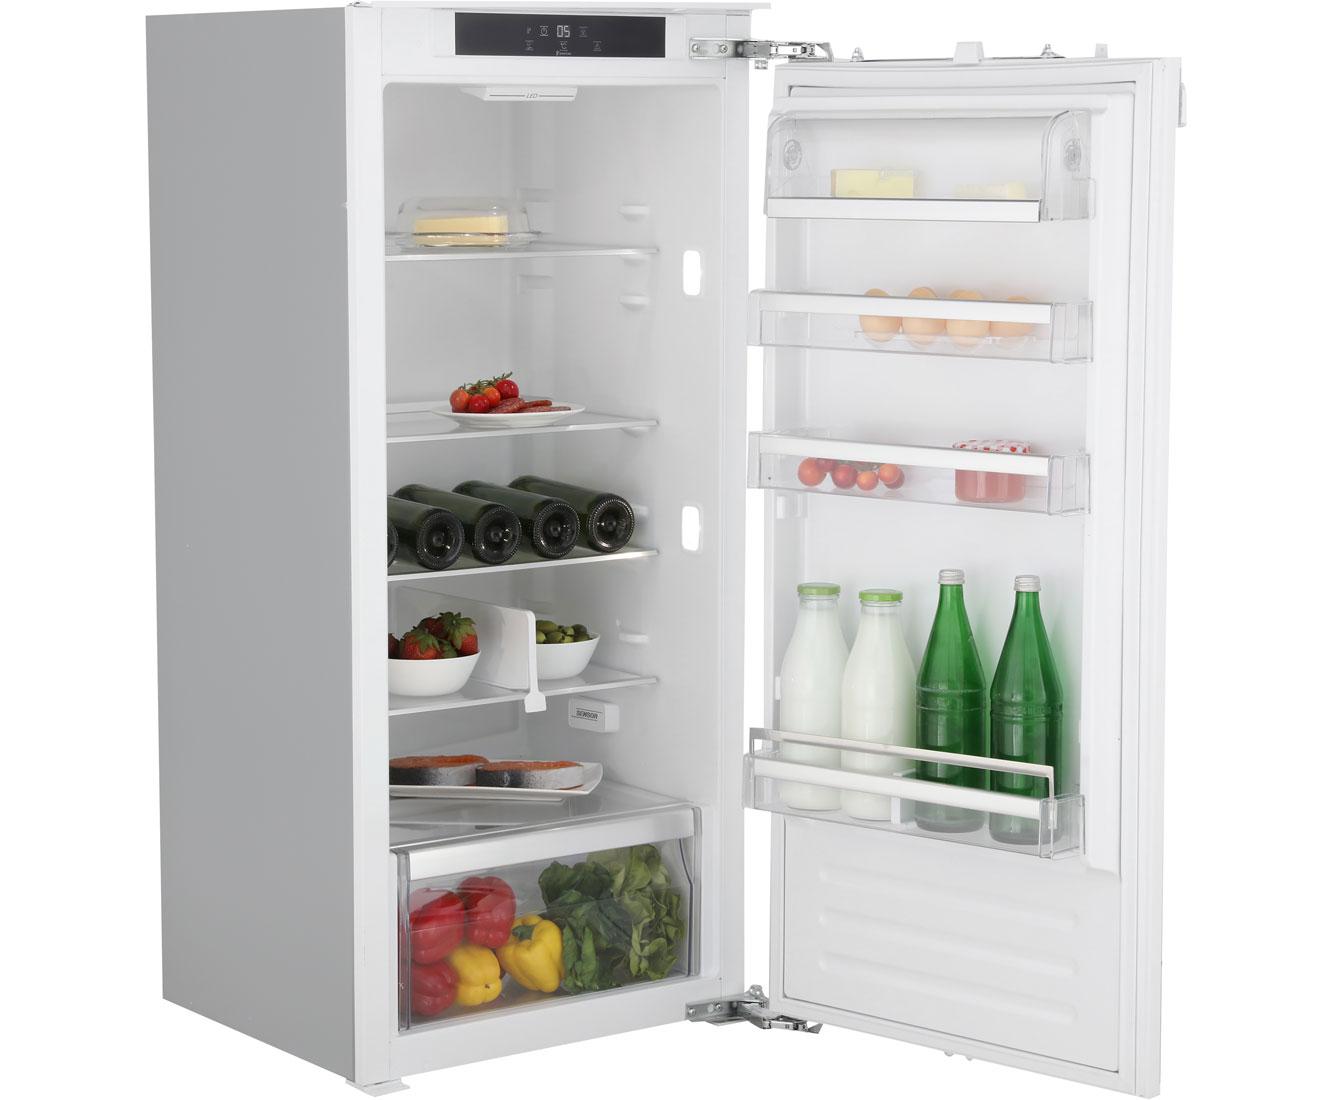 Kühlschrank Glastür : Kühlschrank preisvergleich kühlschrank 100 liter preisvergleich